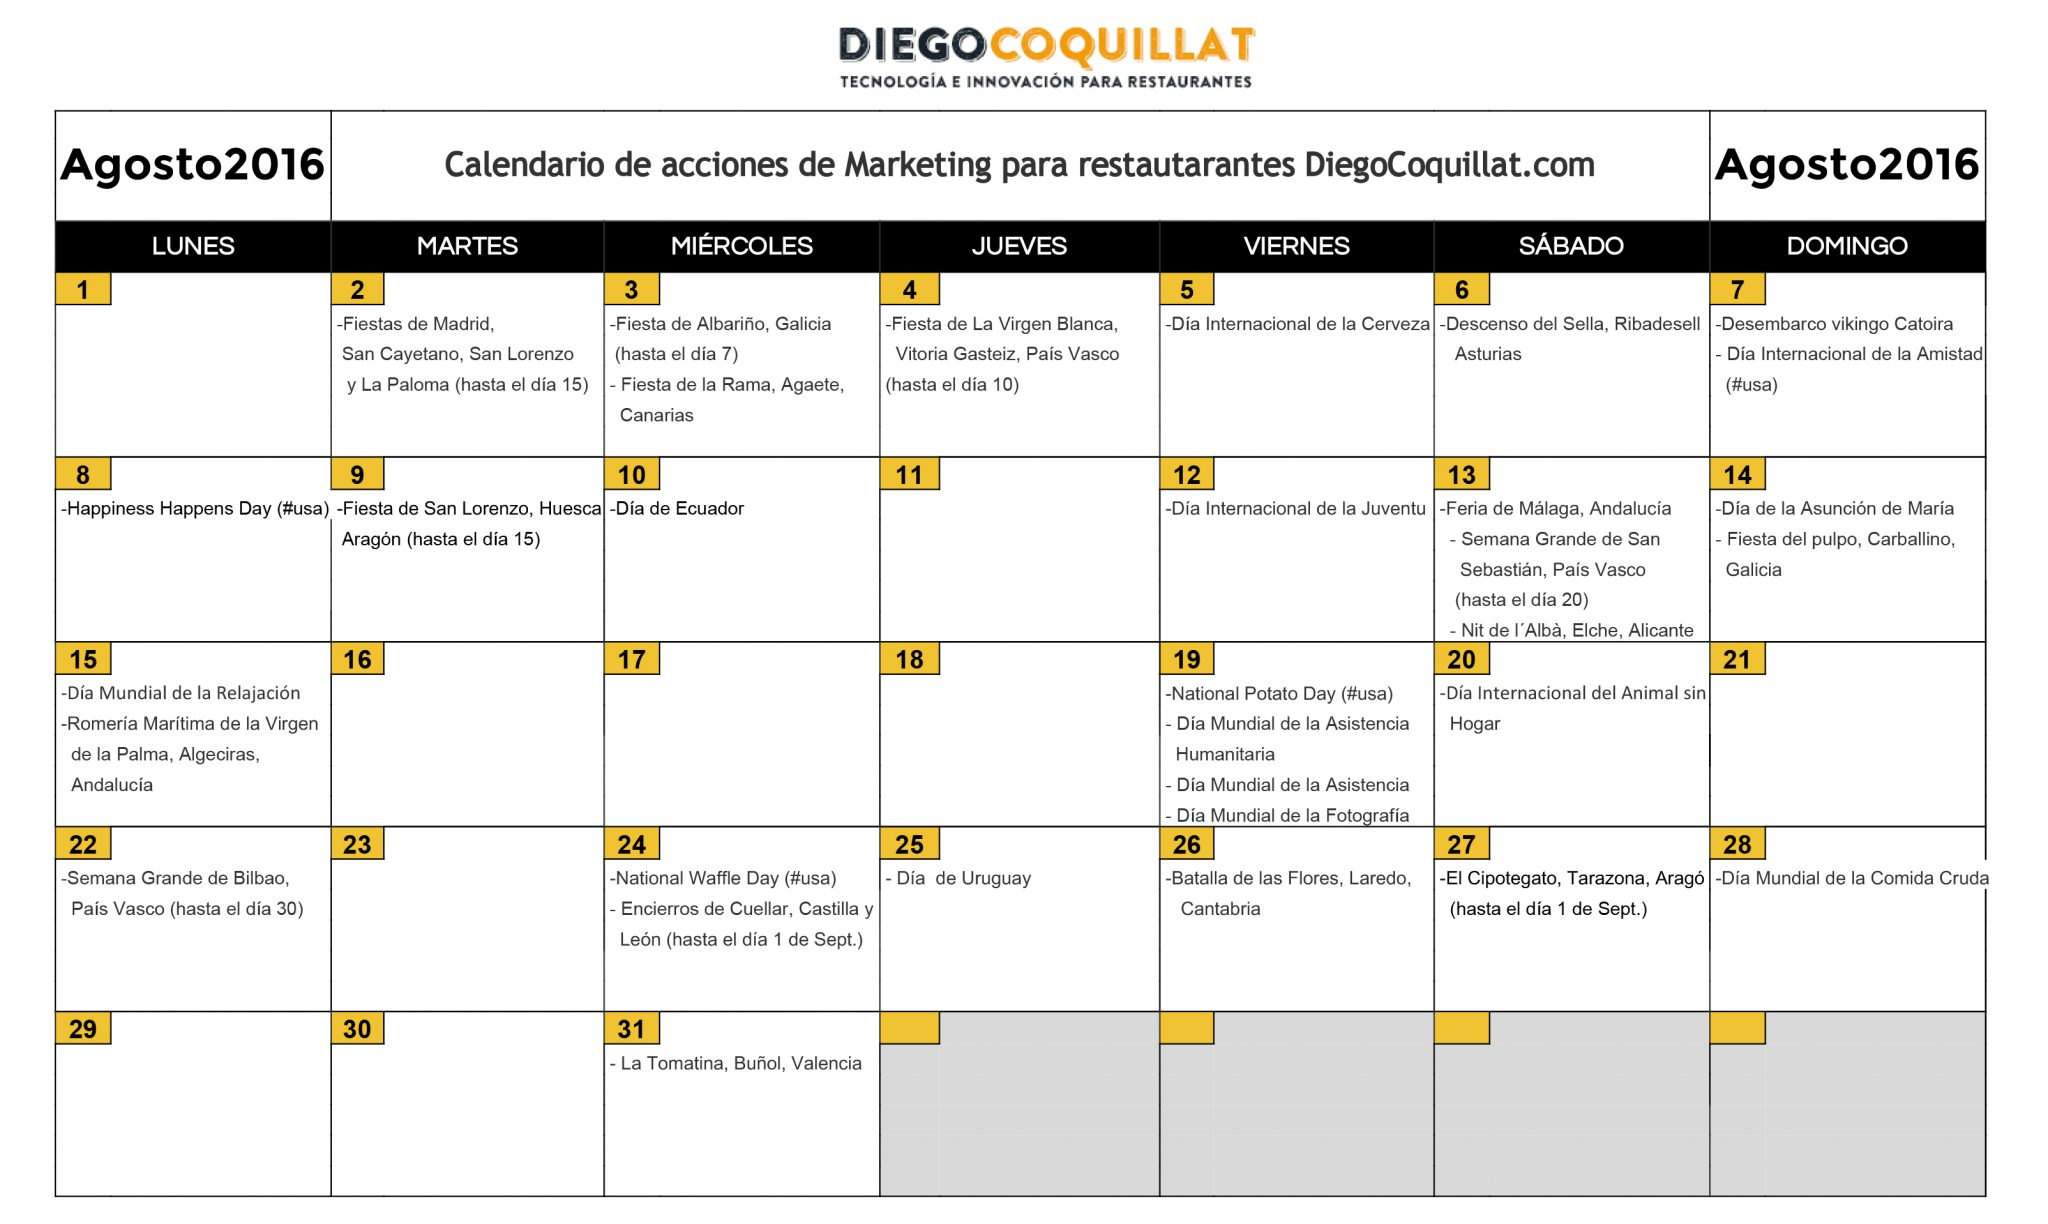 Calendario Grande.August 2016 Marketing Activities Calendar For Restaurants